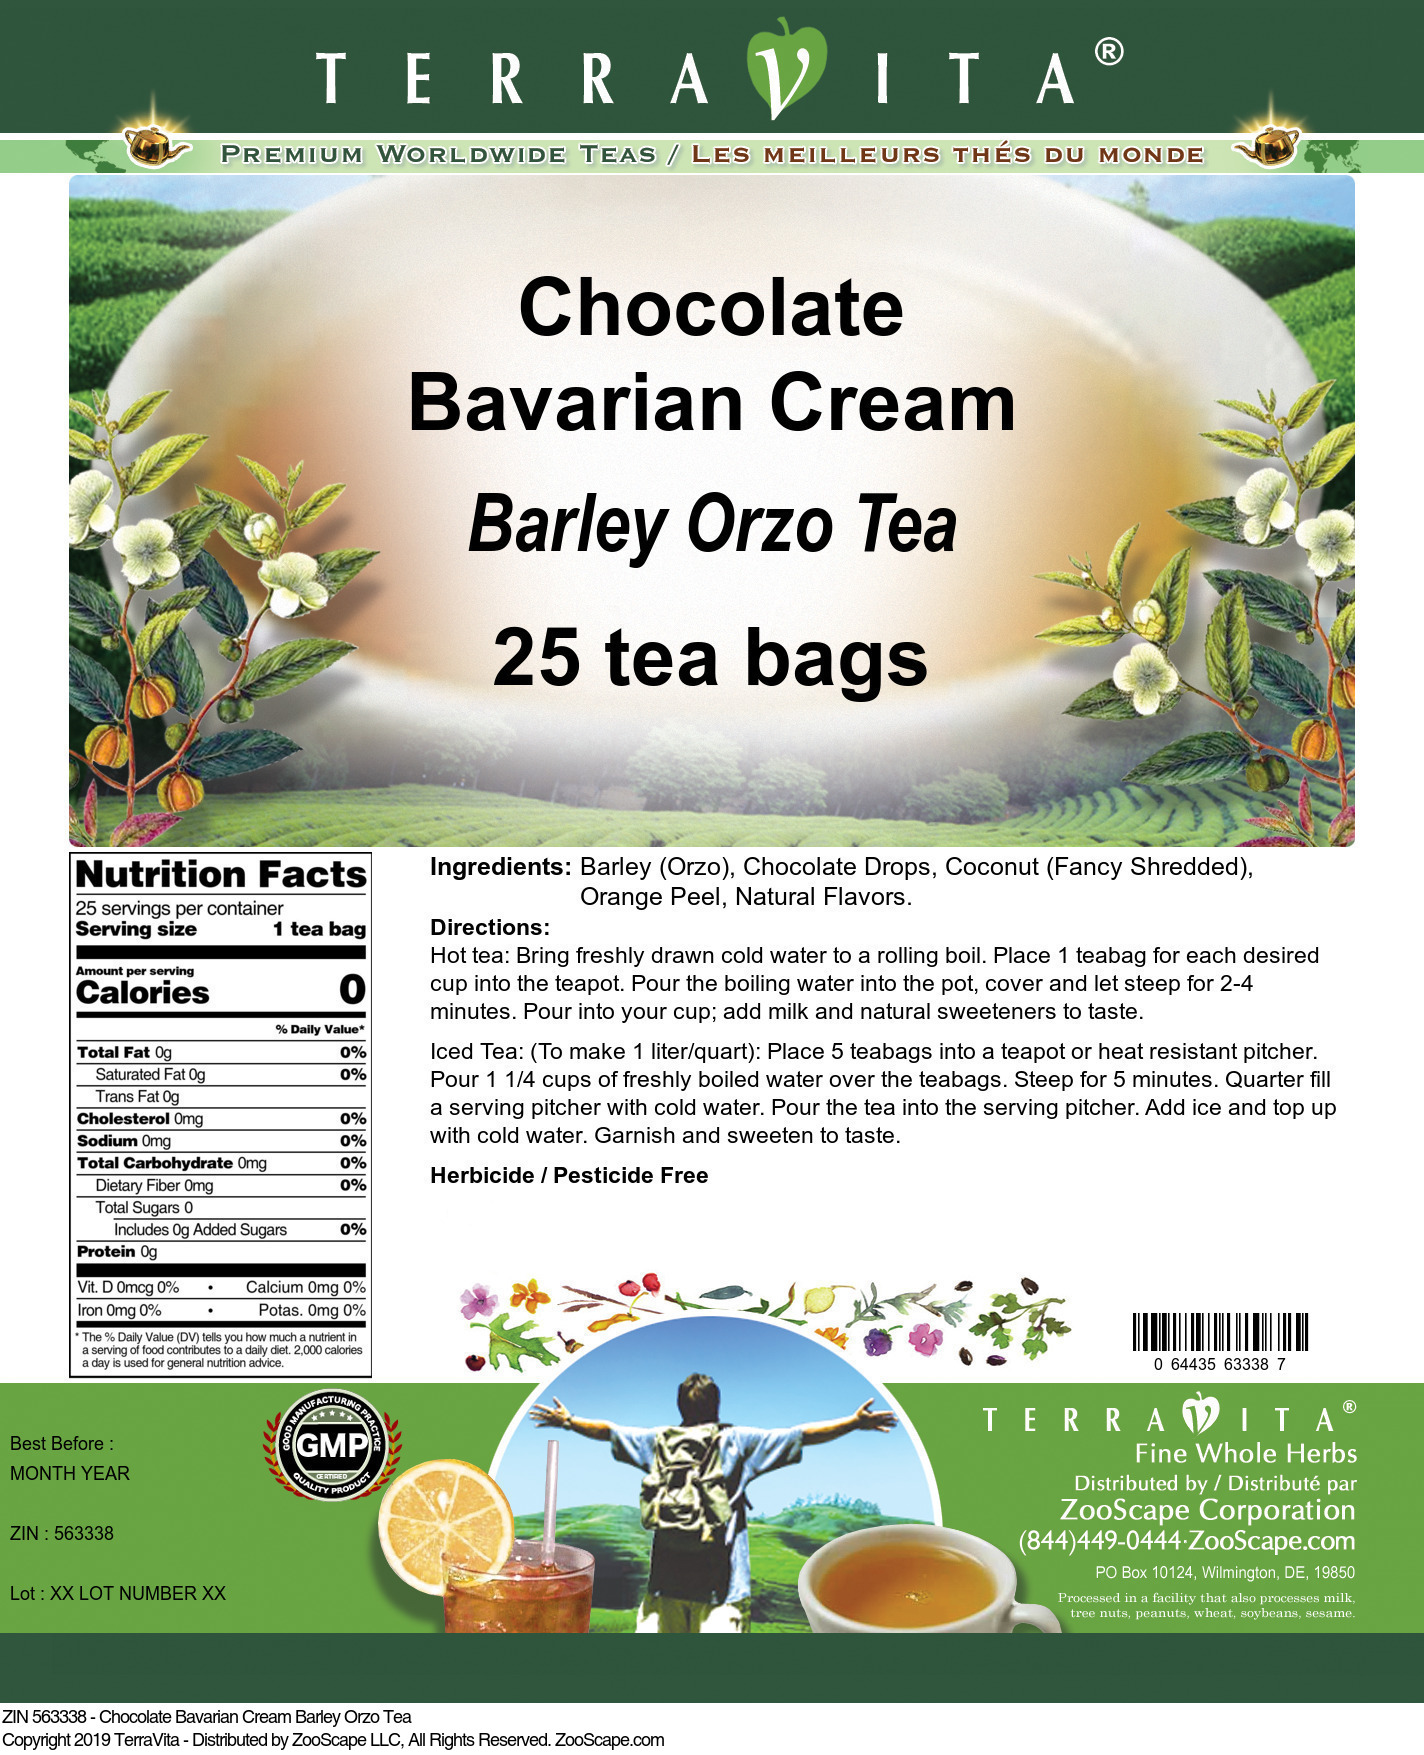 Chocolate Bavarian Cream Barley Orzo Tea